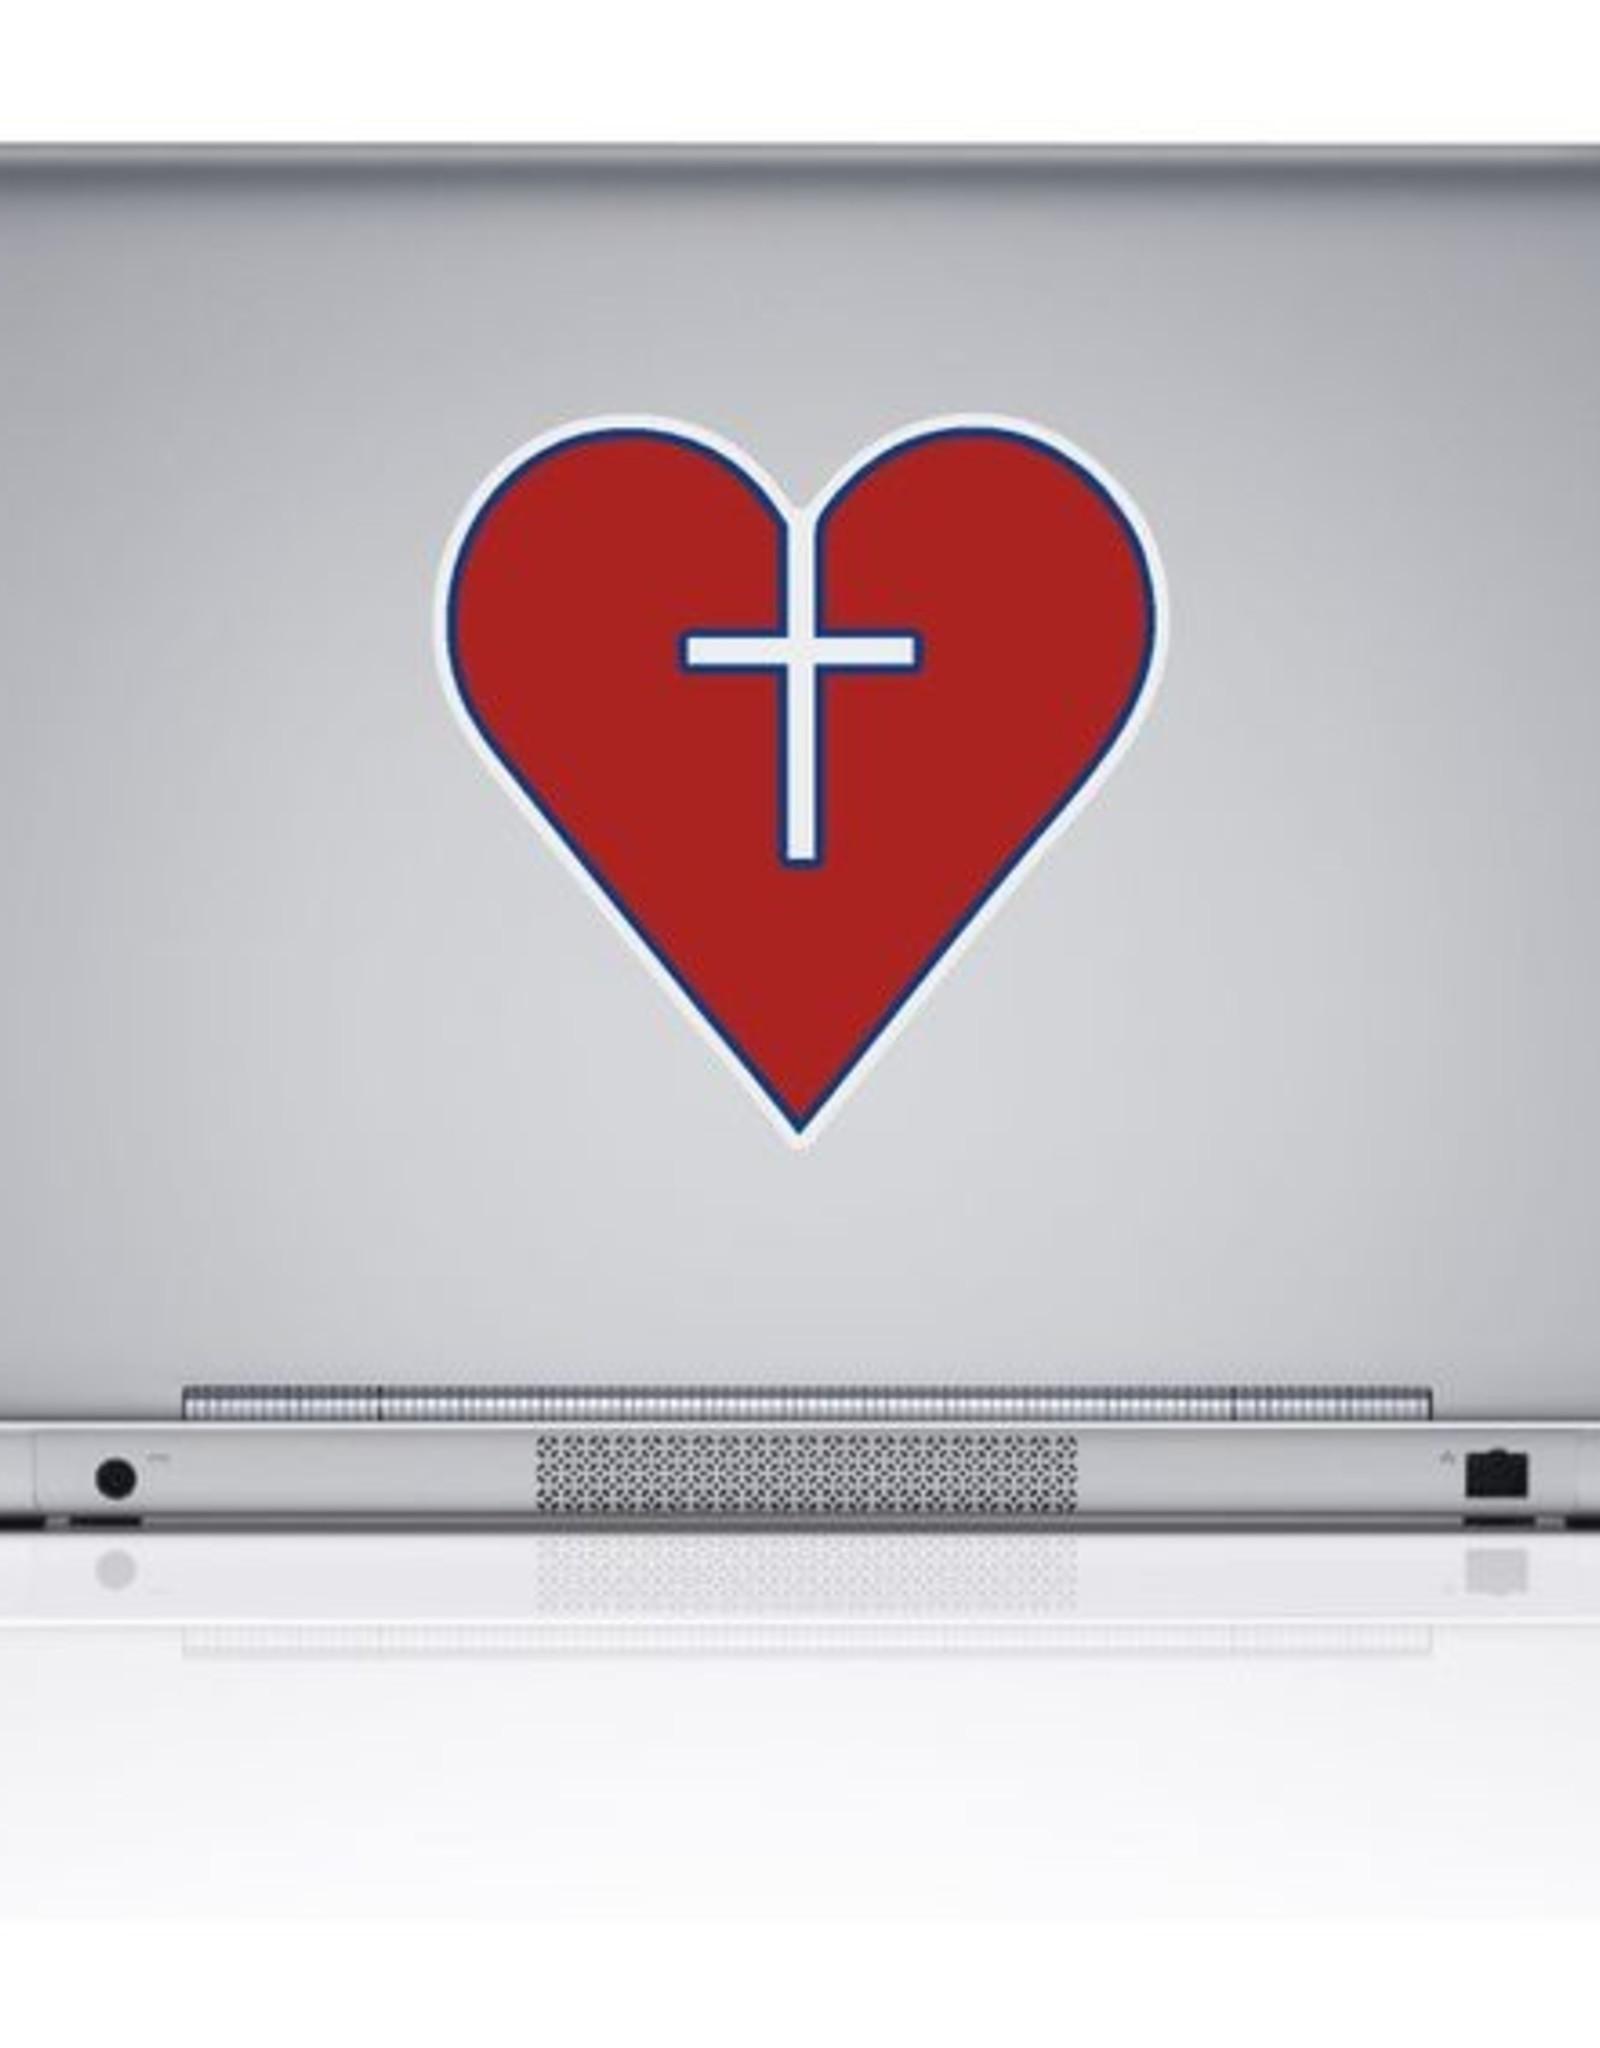 CDI HEART LG REMOVE DECAL